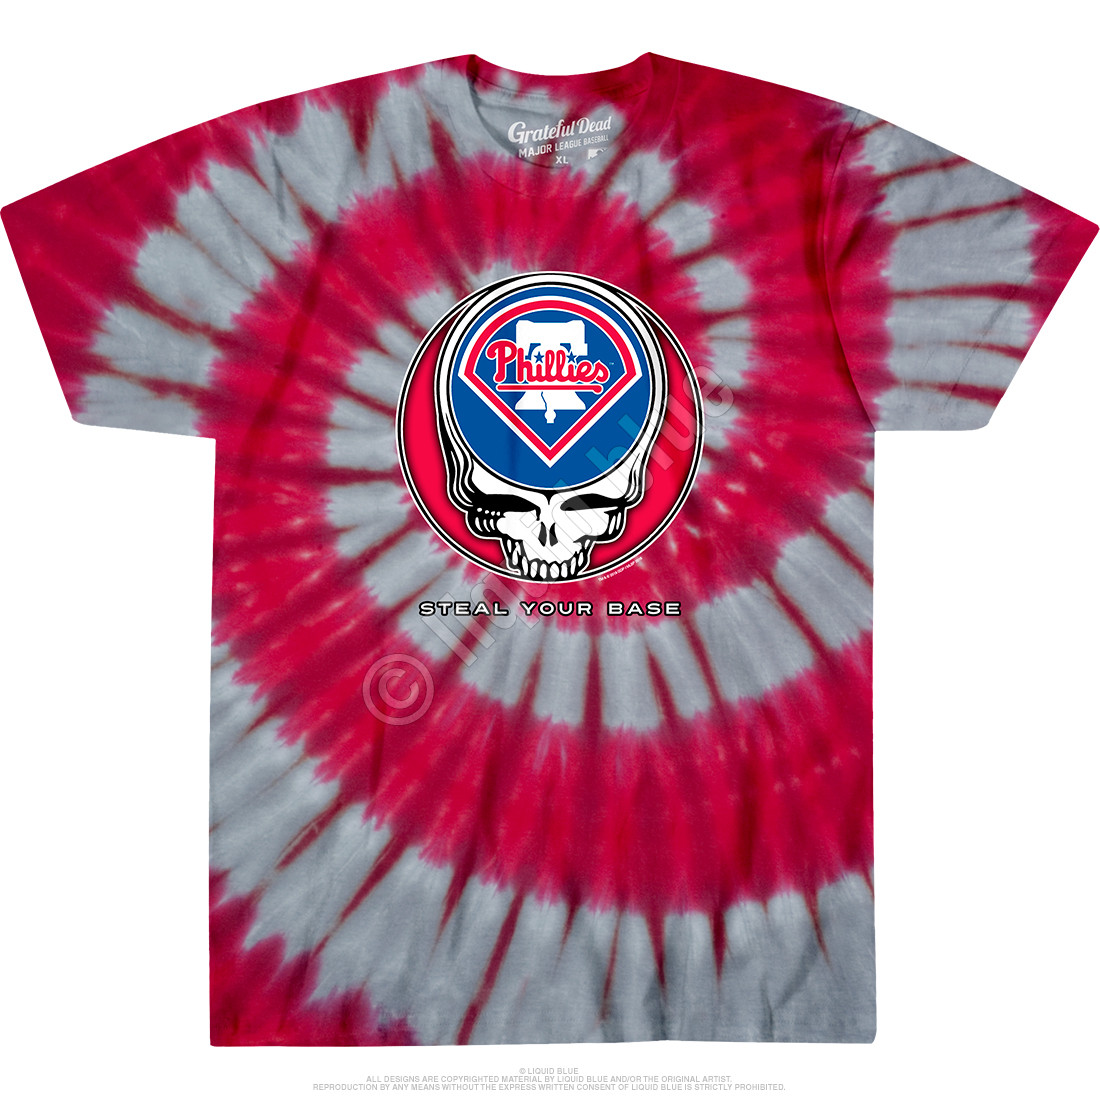 Philadelphia Phillies Steal Your Base Tie-Dye T-Shirt